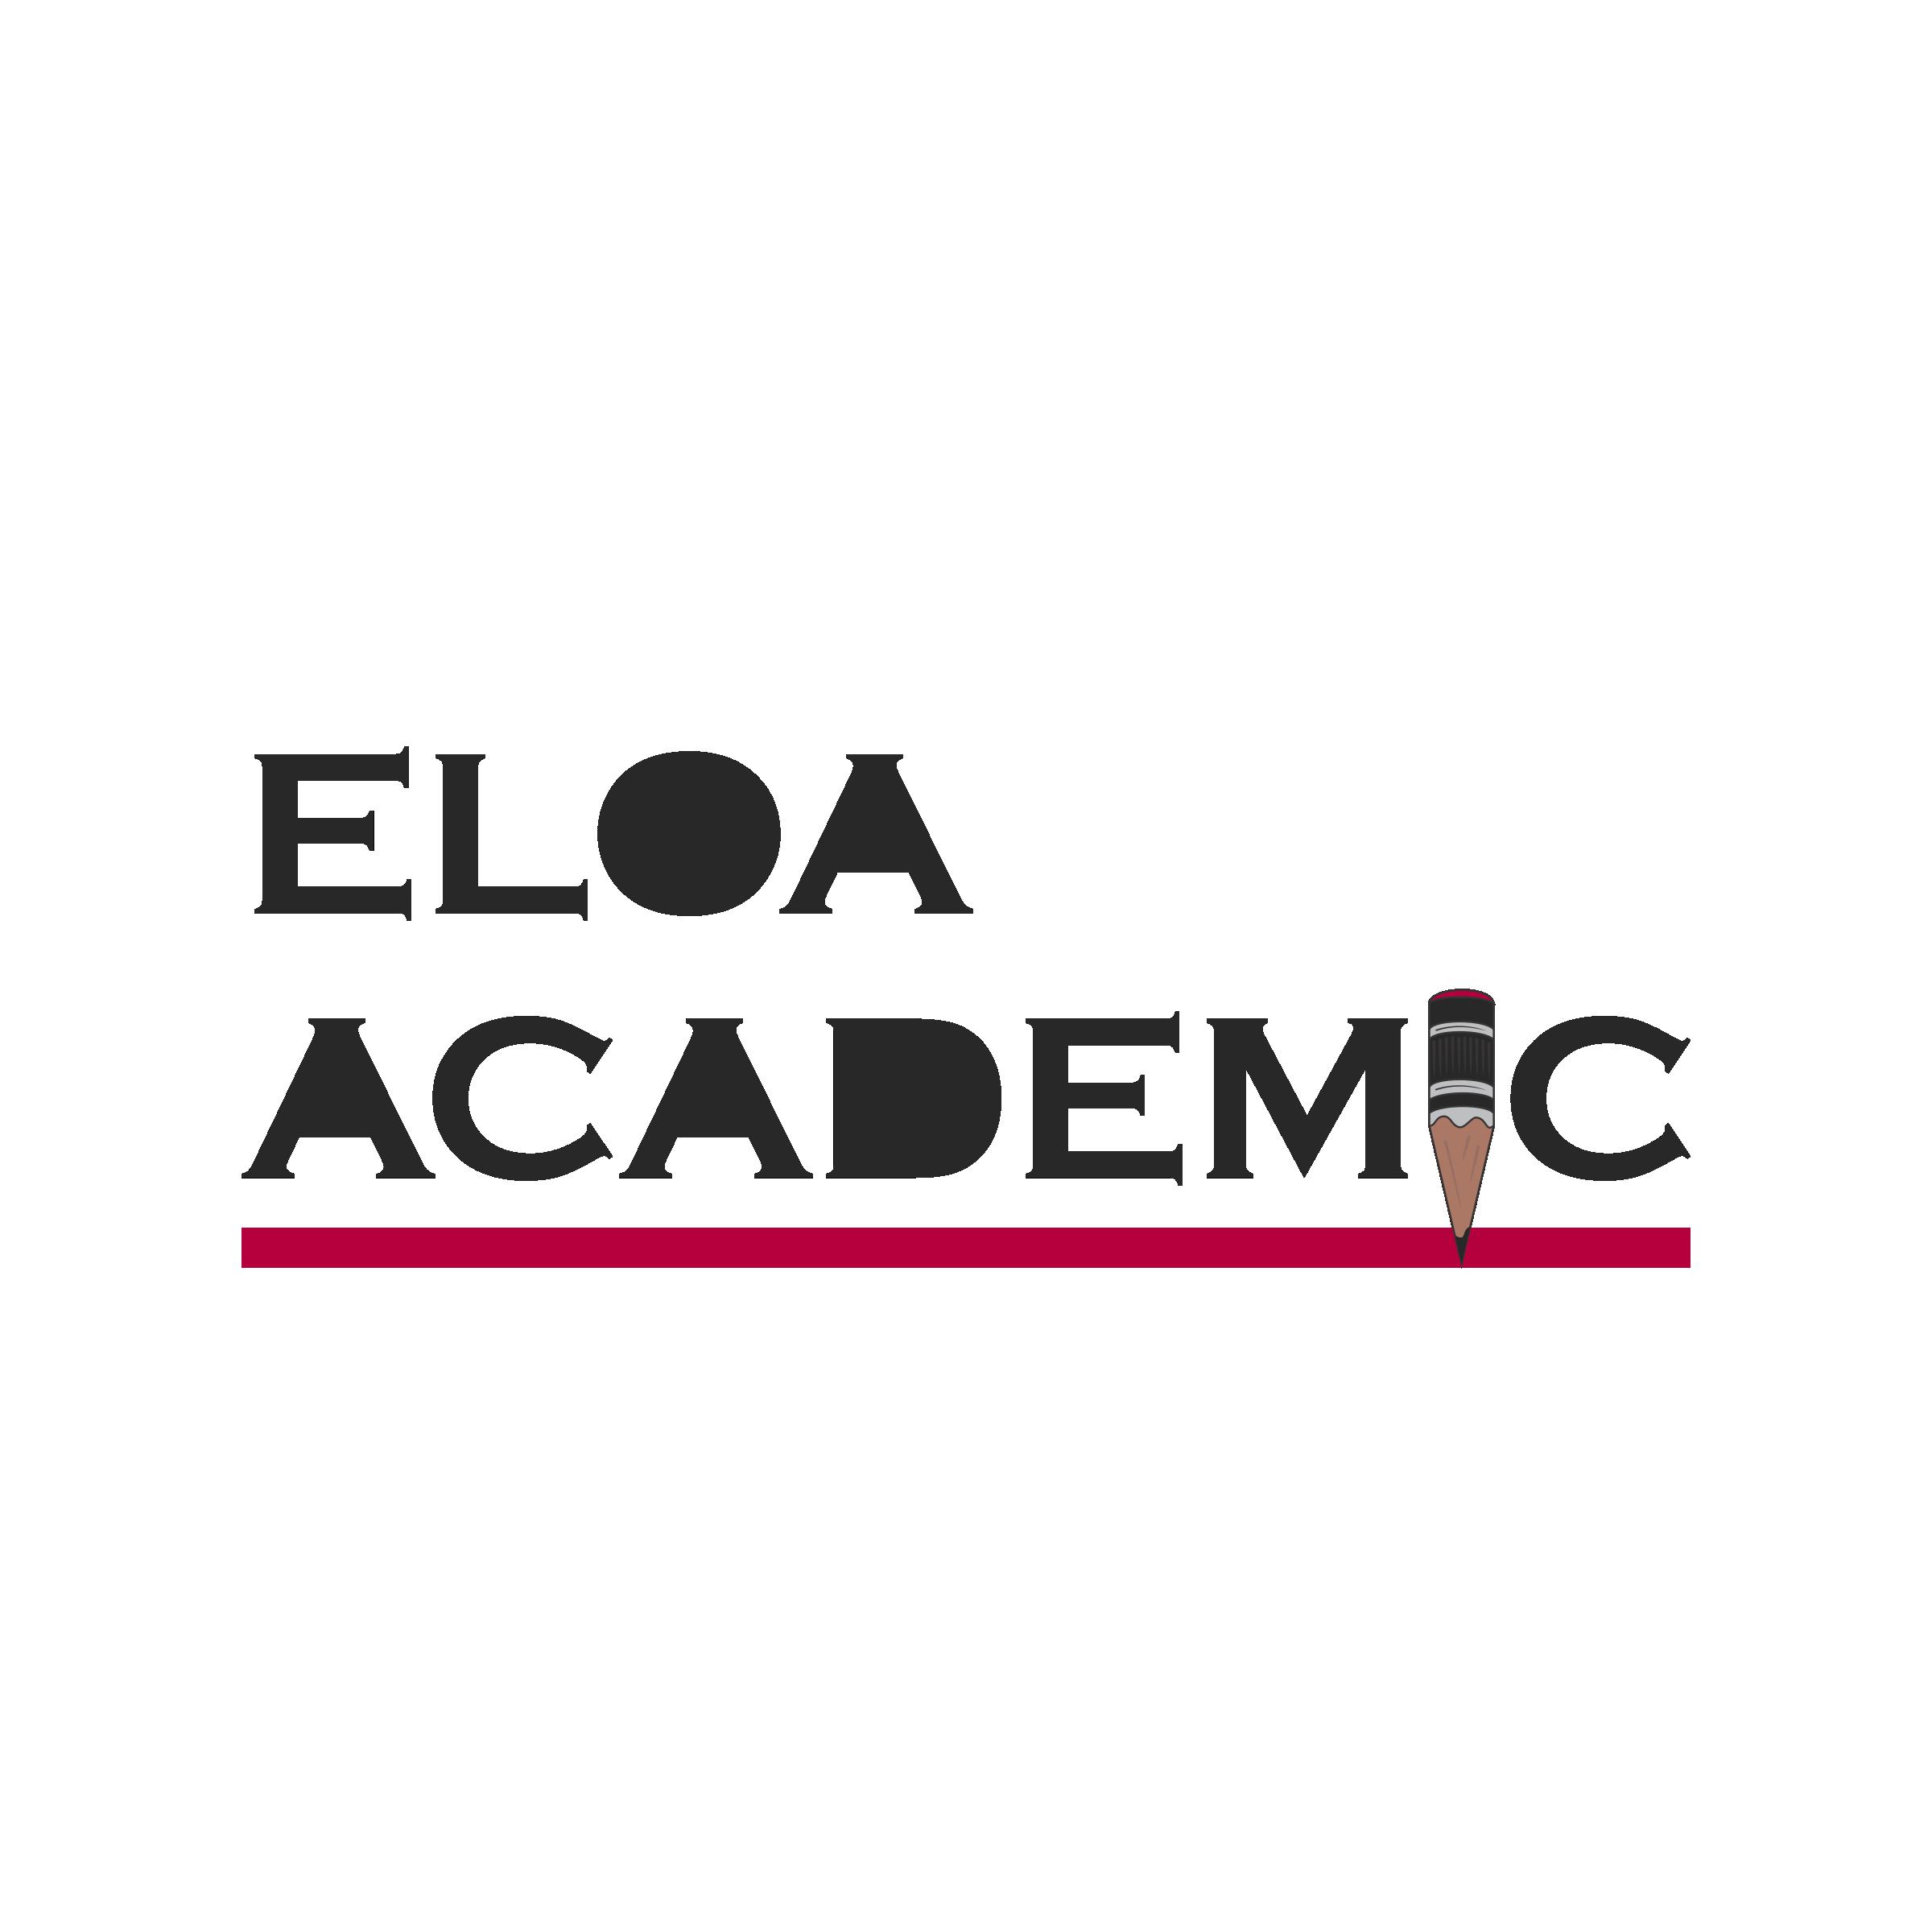 Eloa Academic